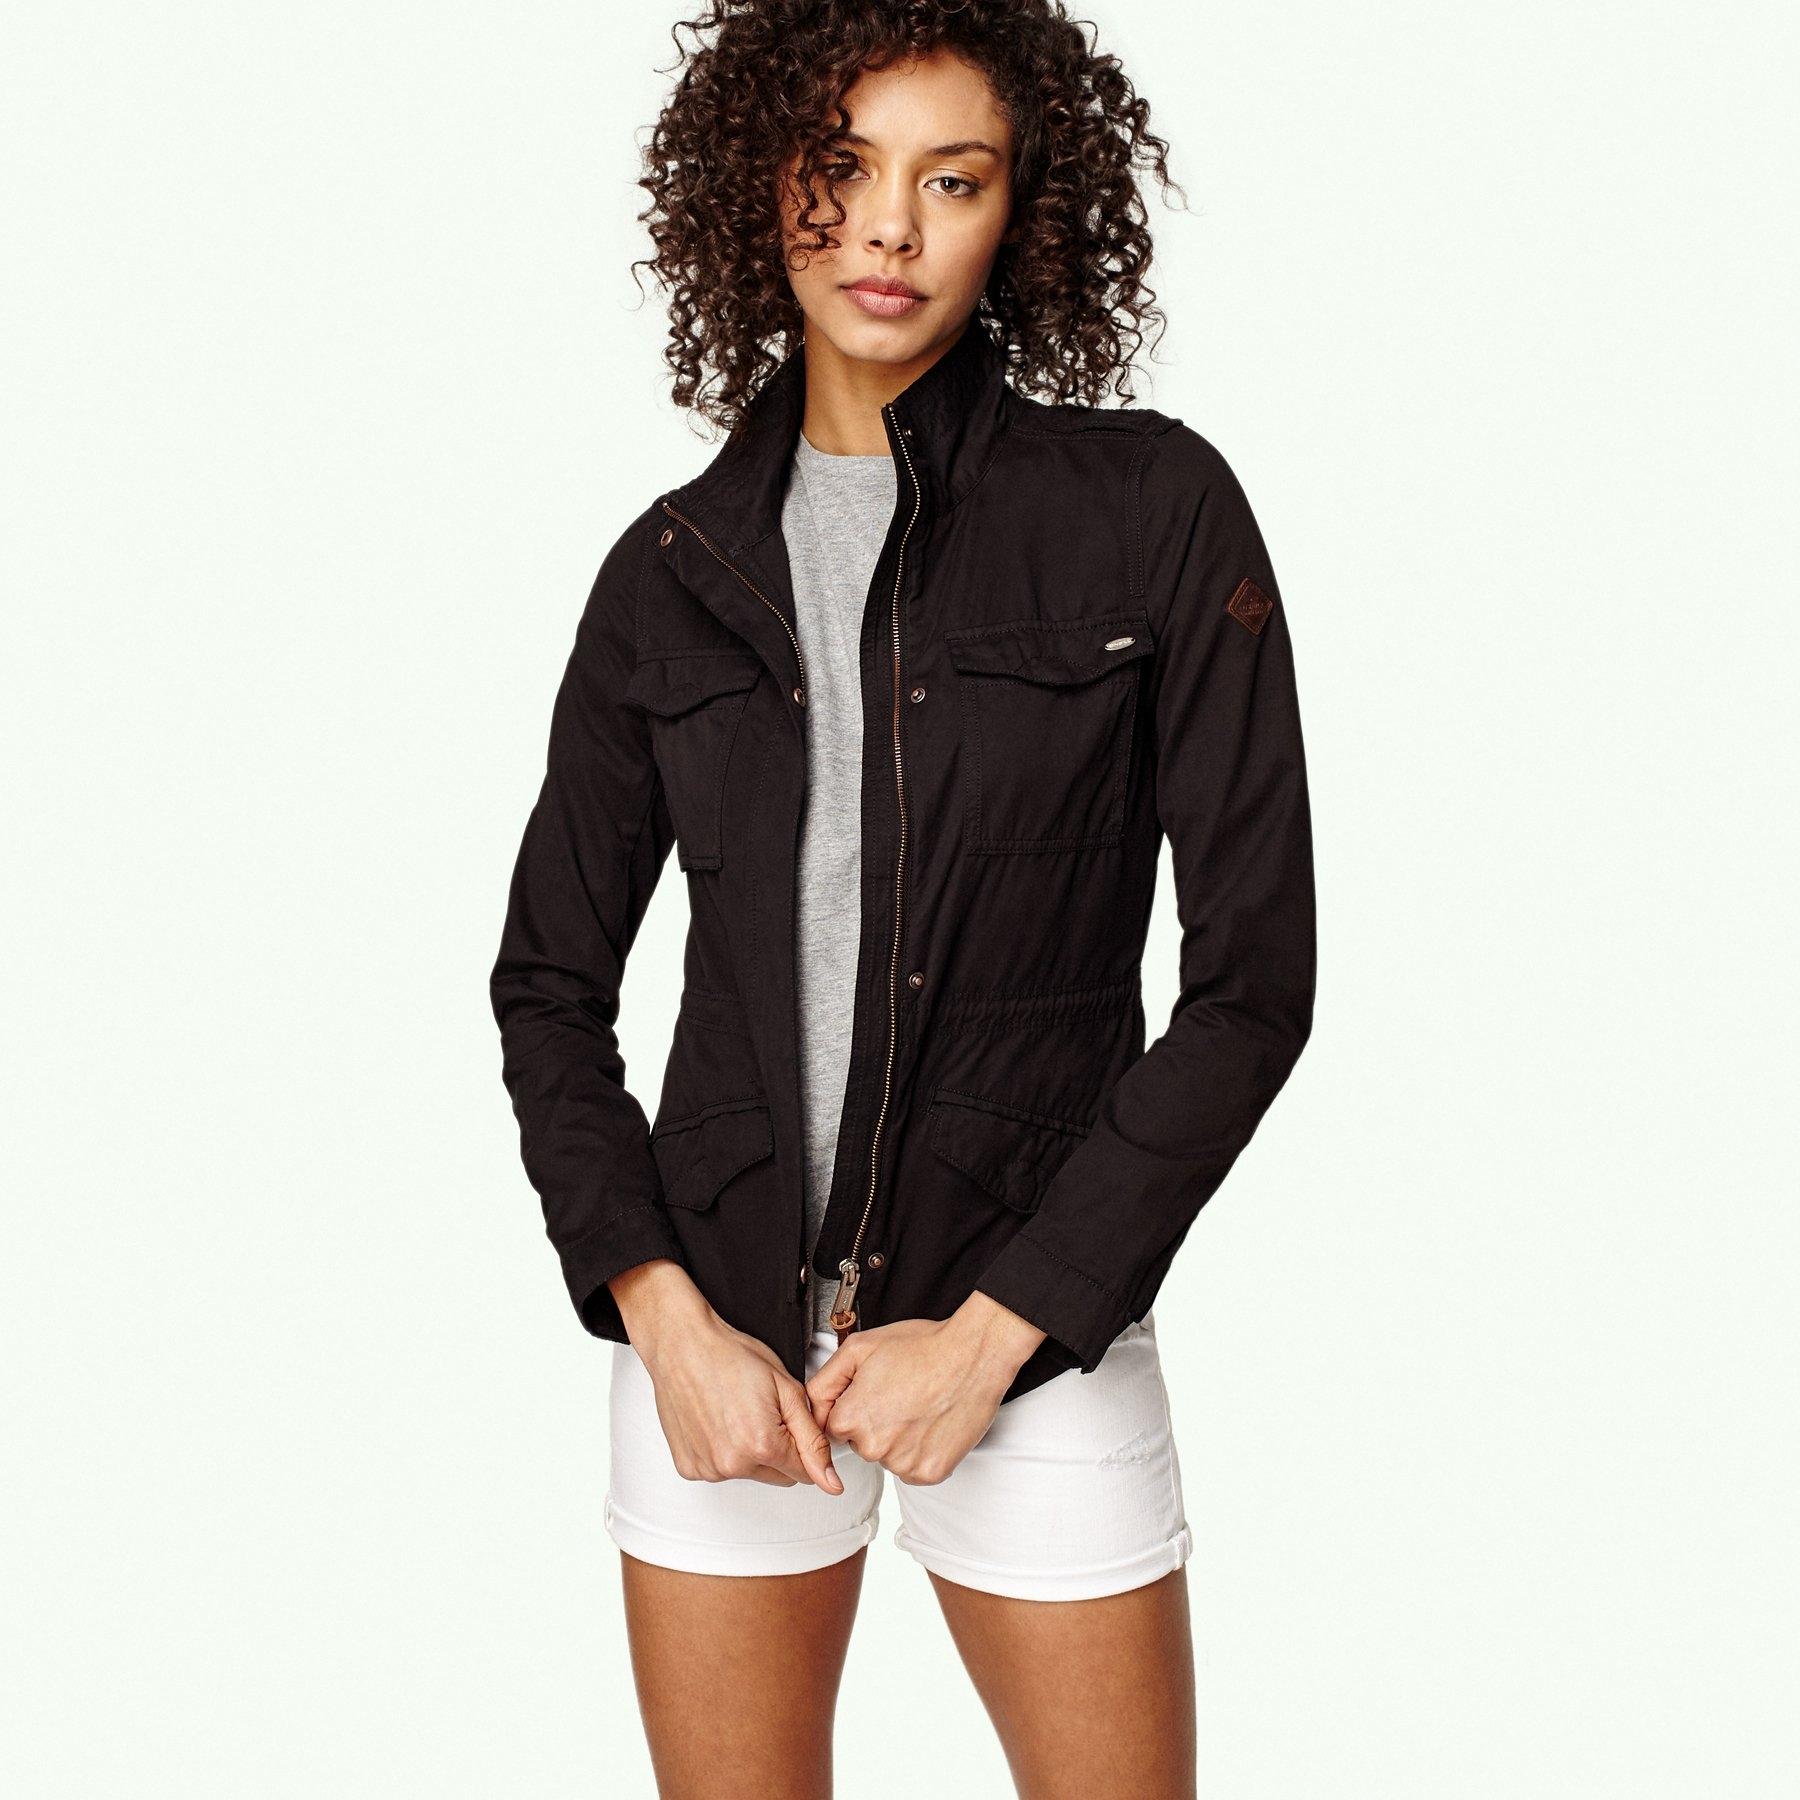 O'neill Outdoorjas »Short utility field jacket« bij OTTO online kopen